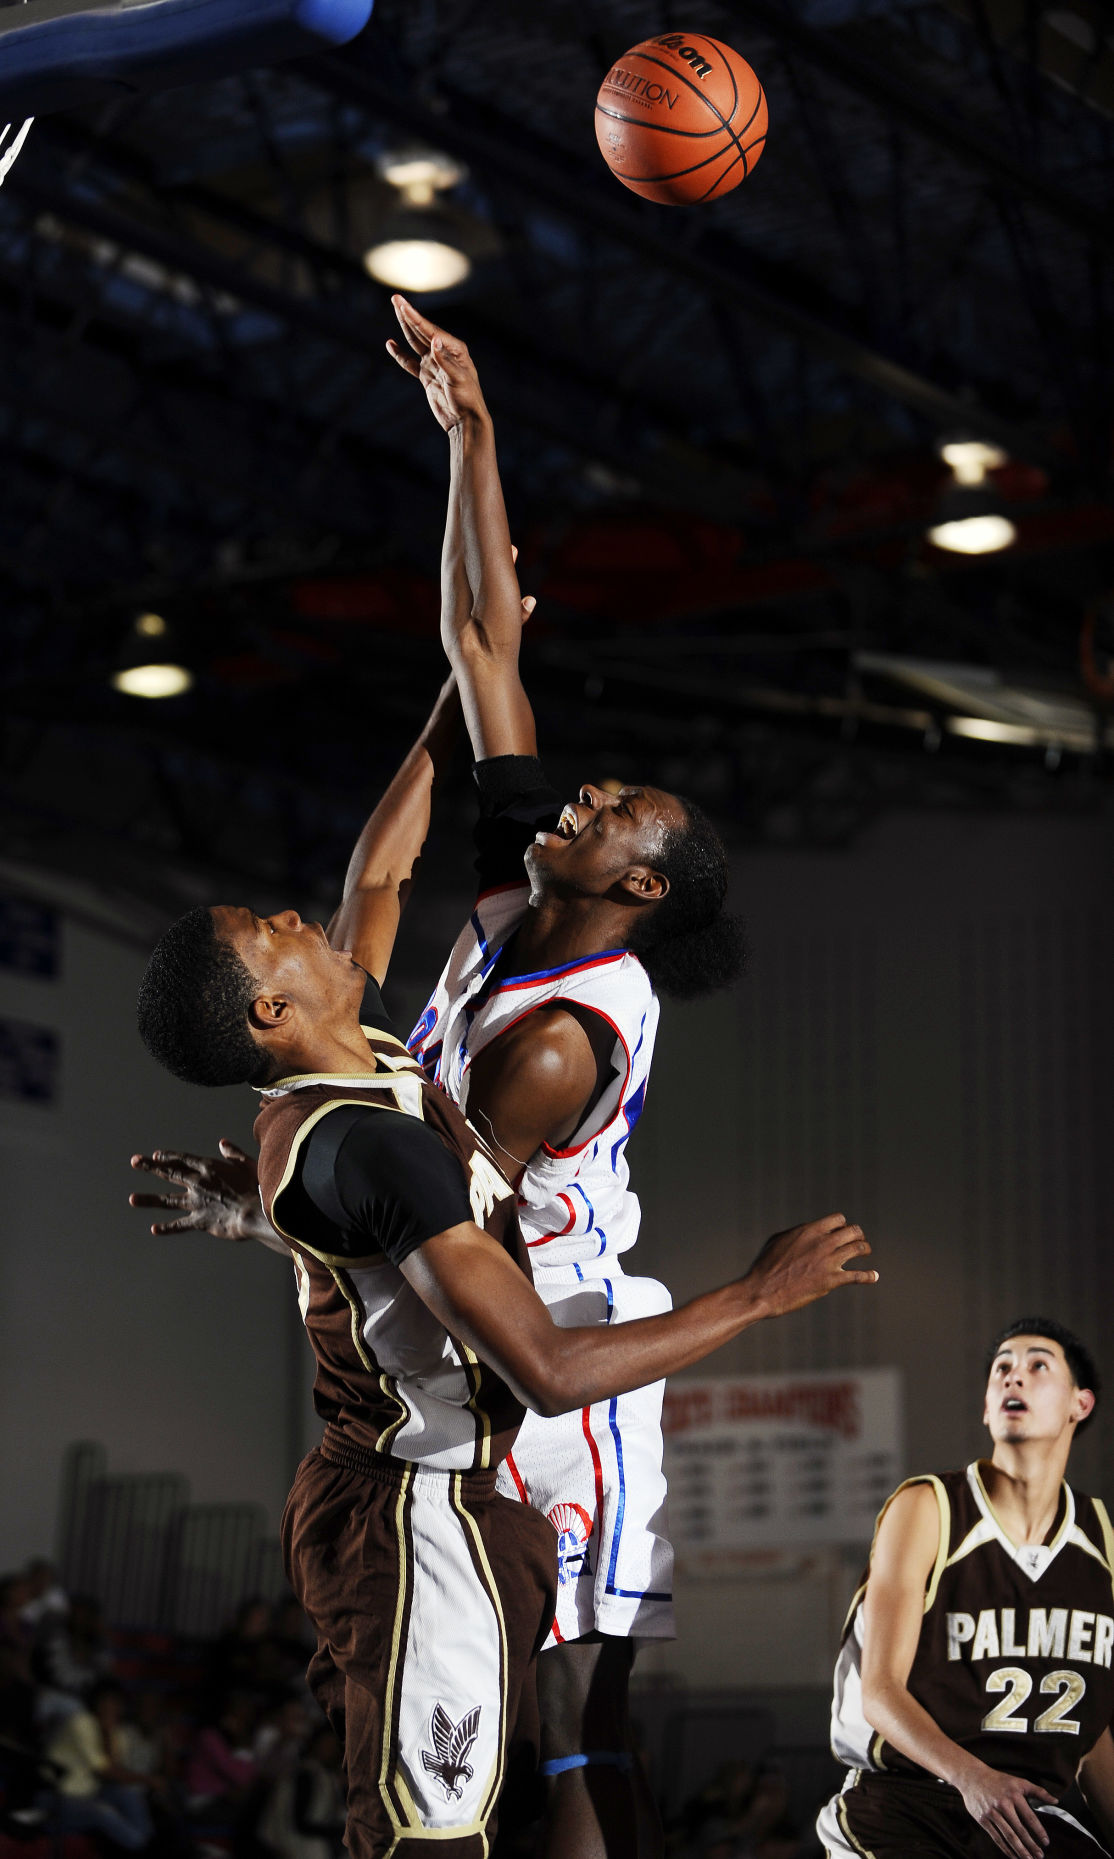 Fountain-Fort Carson Basketball